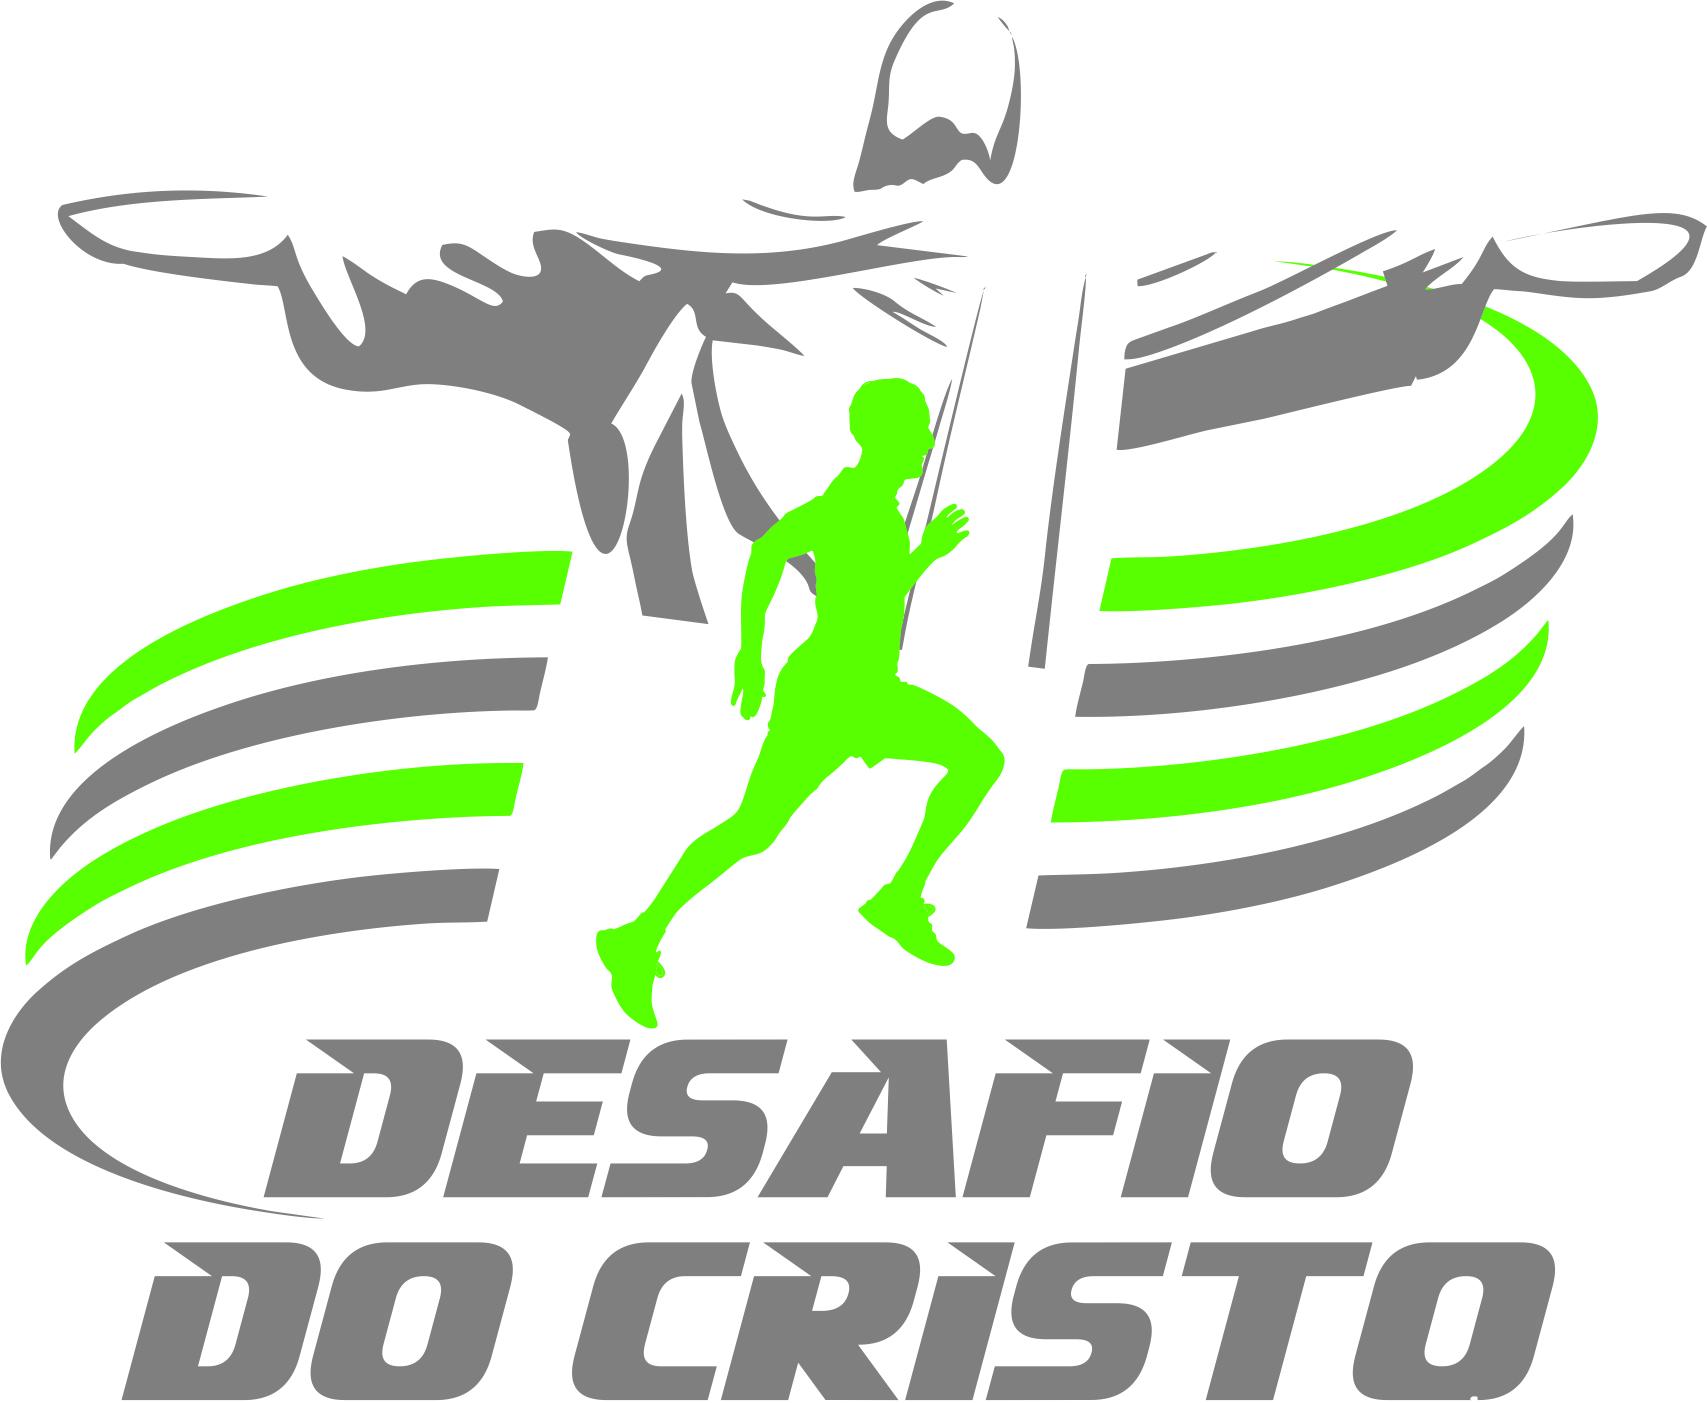 Corrida Desafio do Cristo 2017 - Revista Correr